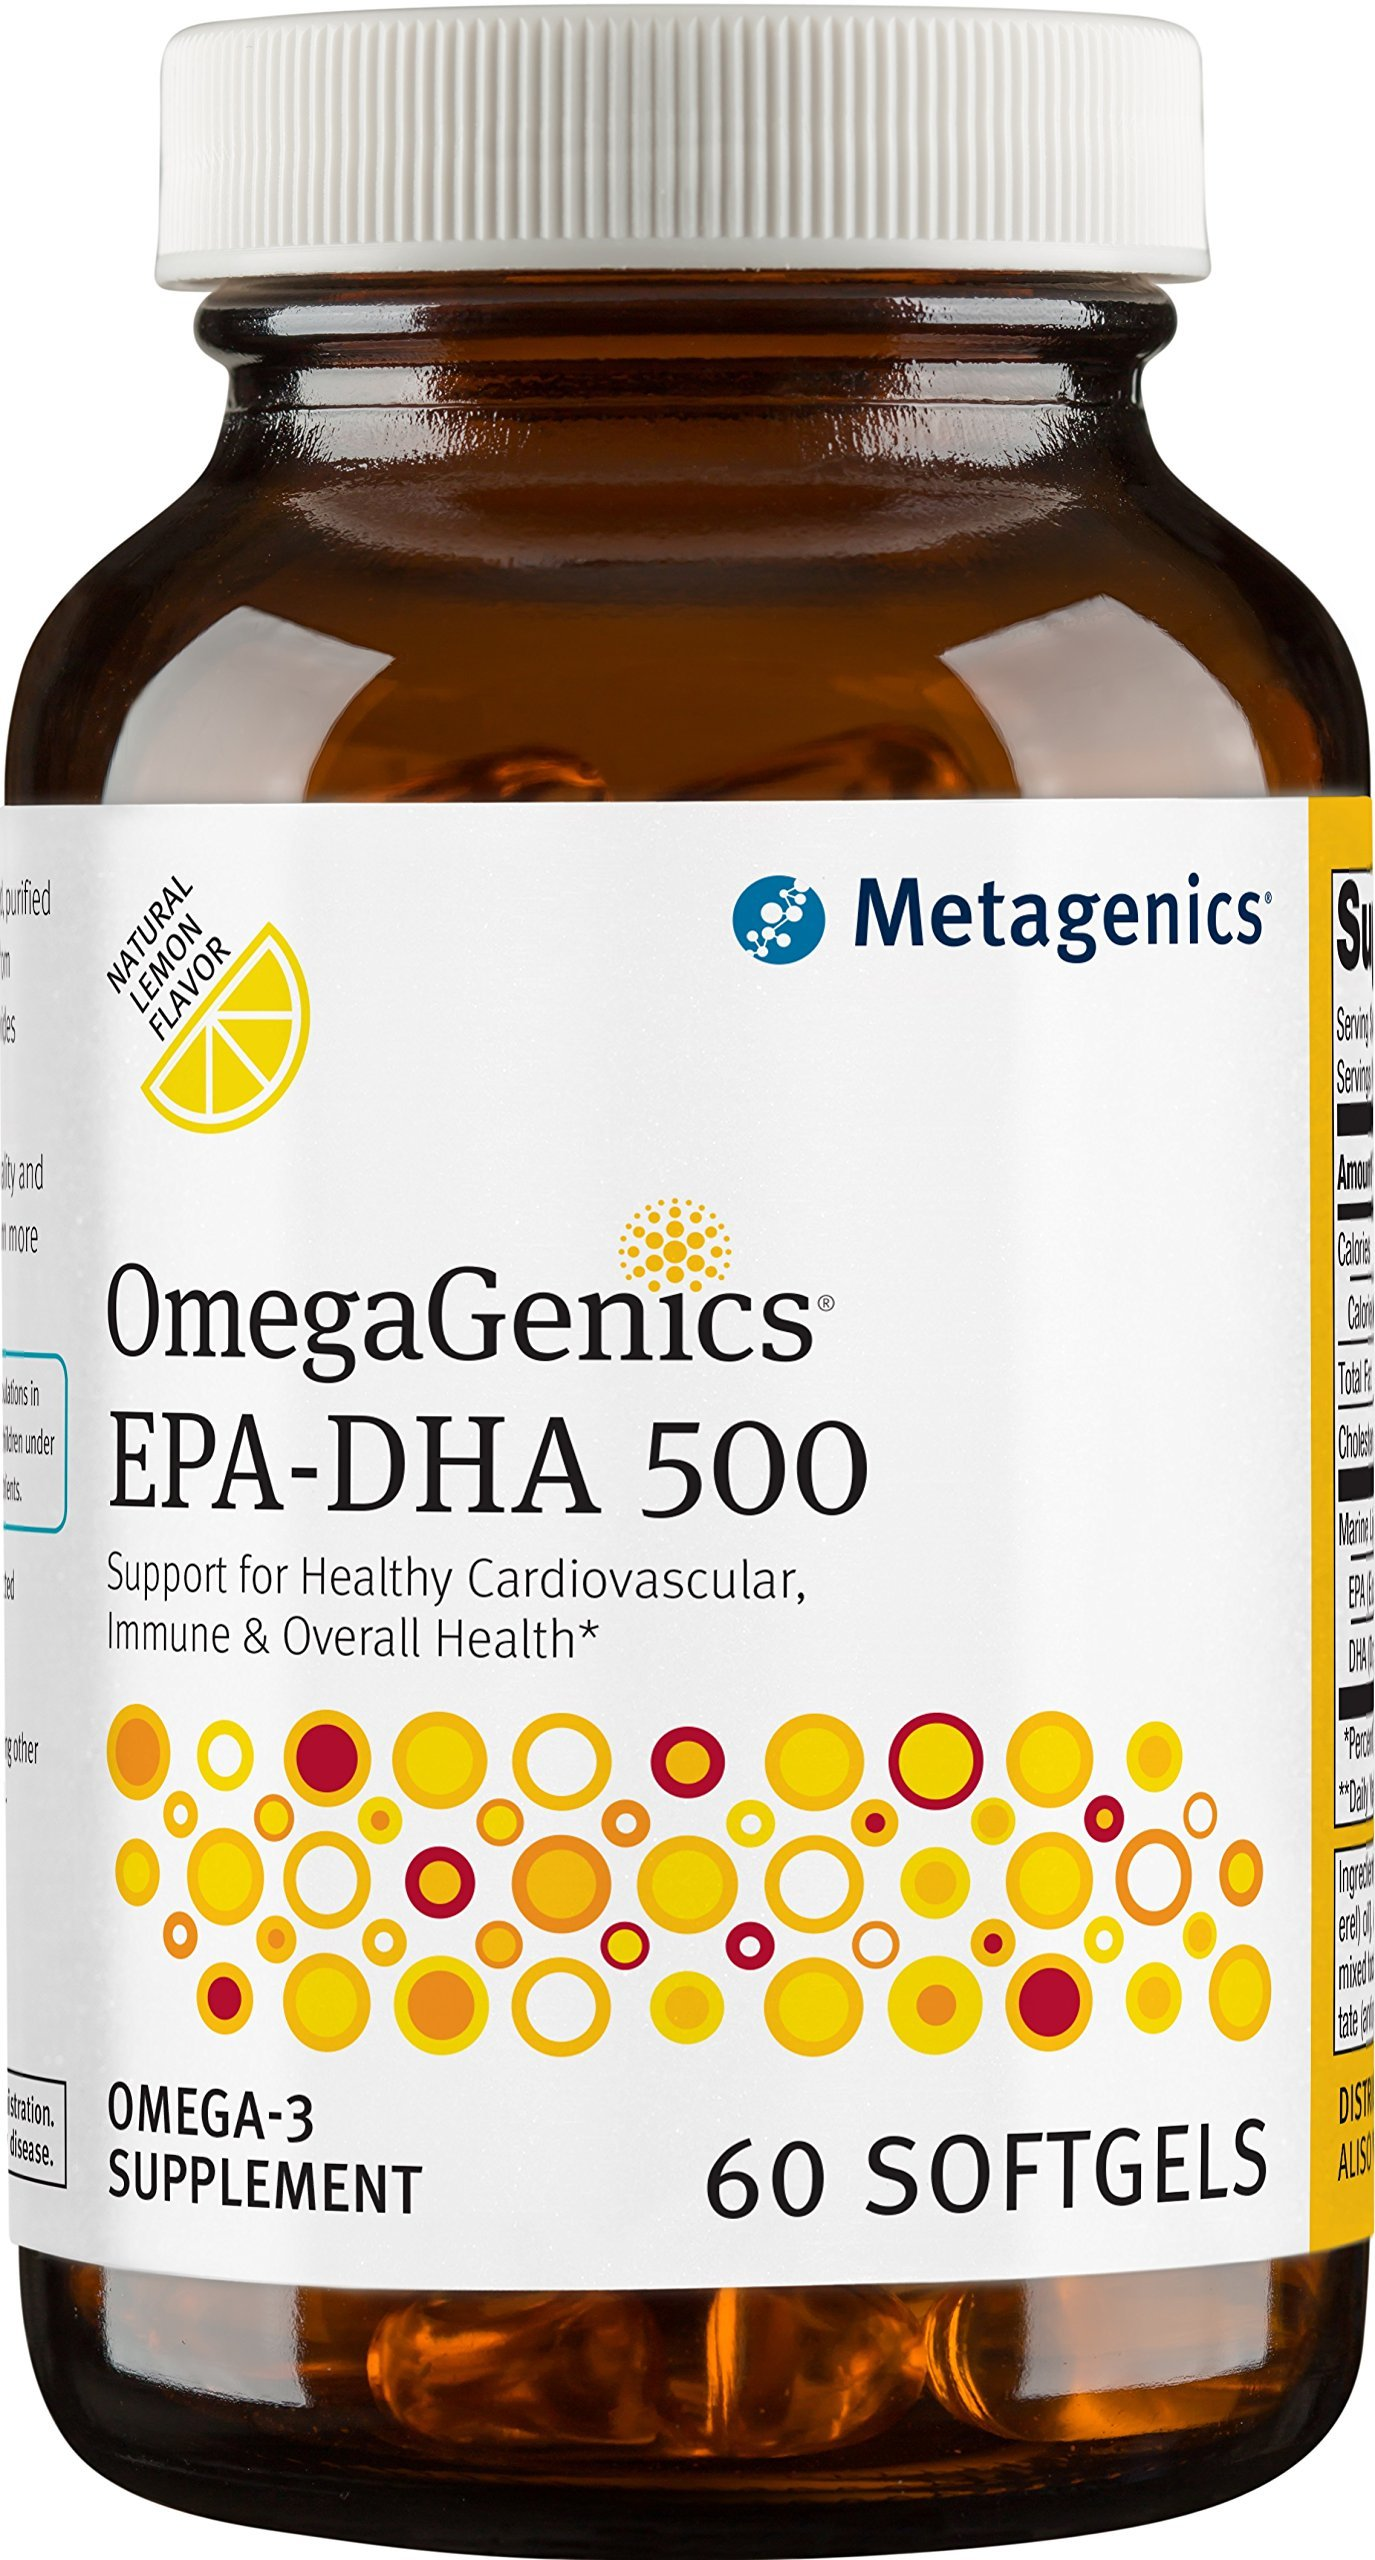 Metagenics - OmegaGenics EPA-DHA 500, 60 Count